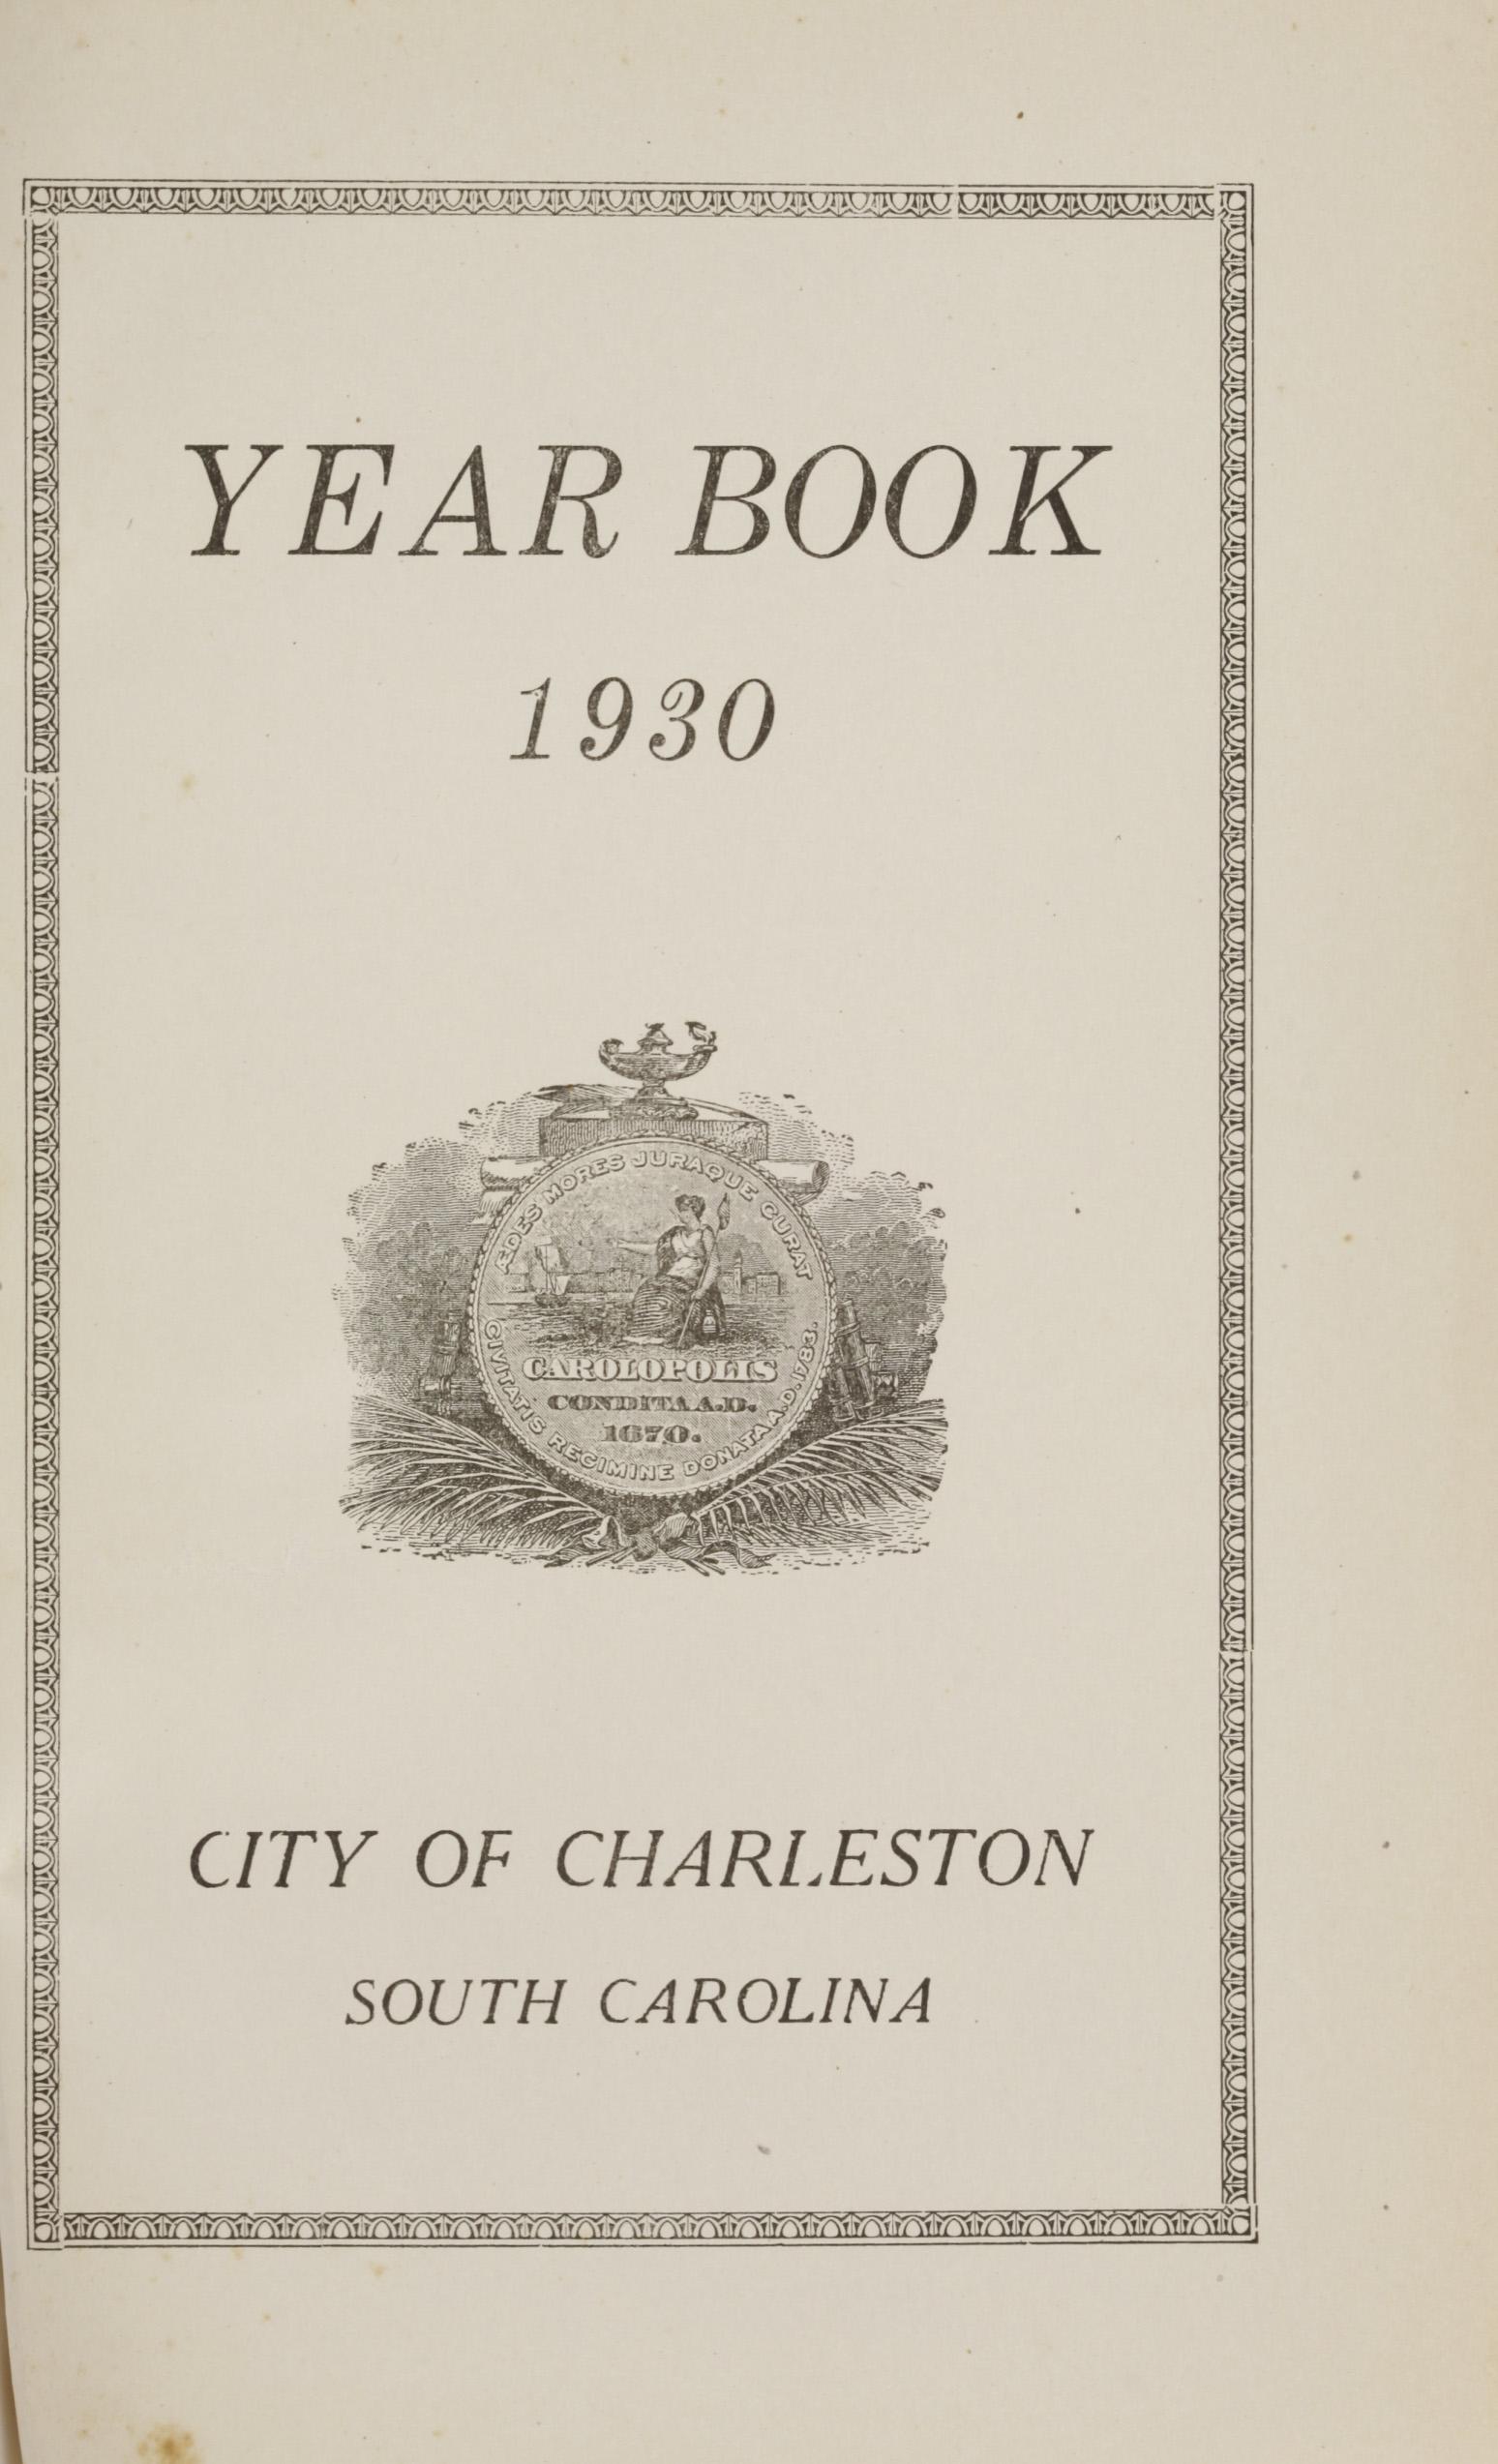 Charleston Yearbook, 1930, page i